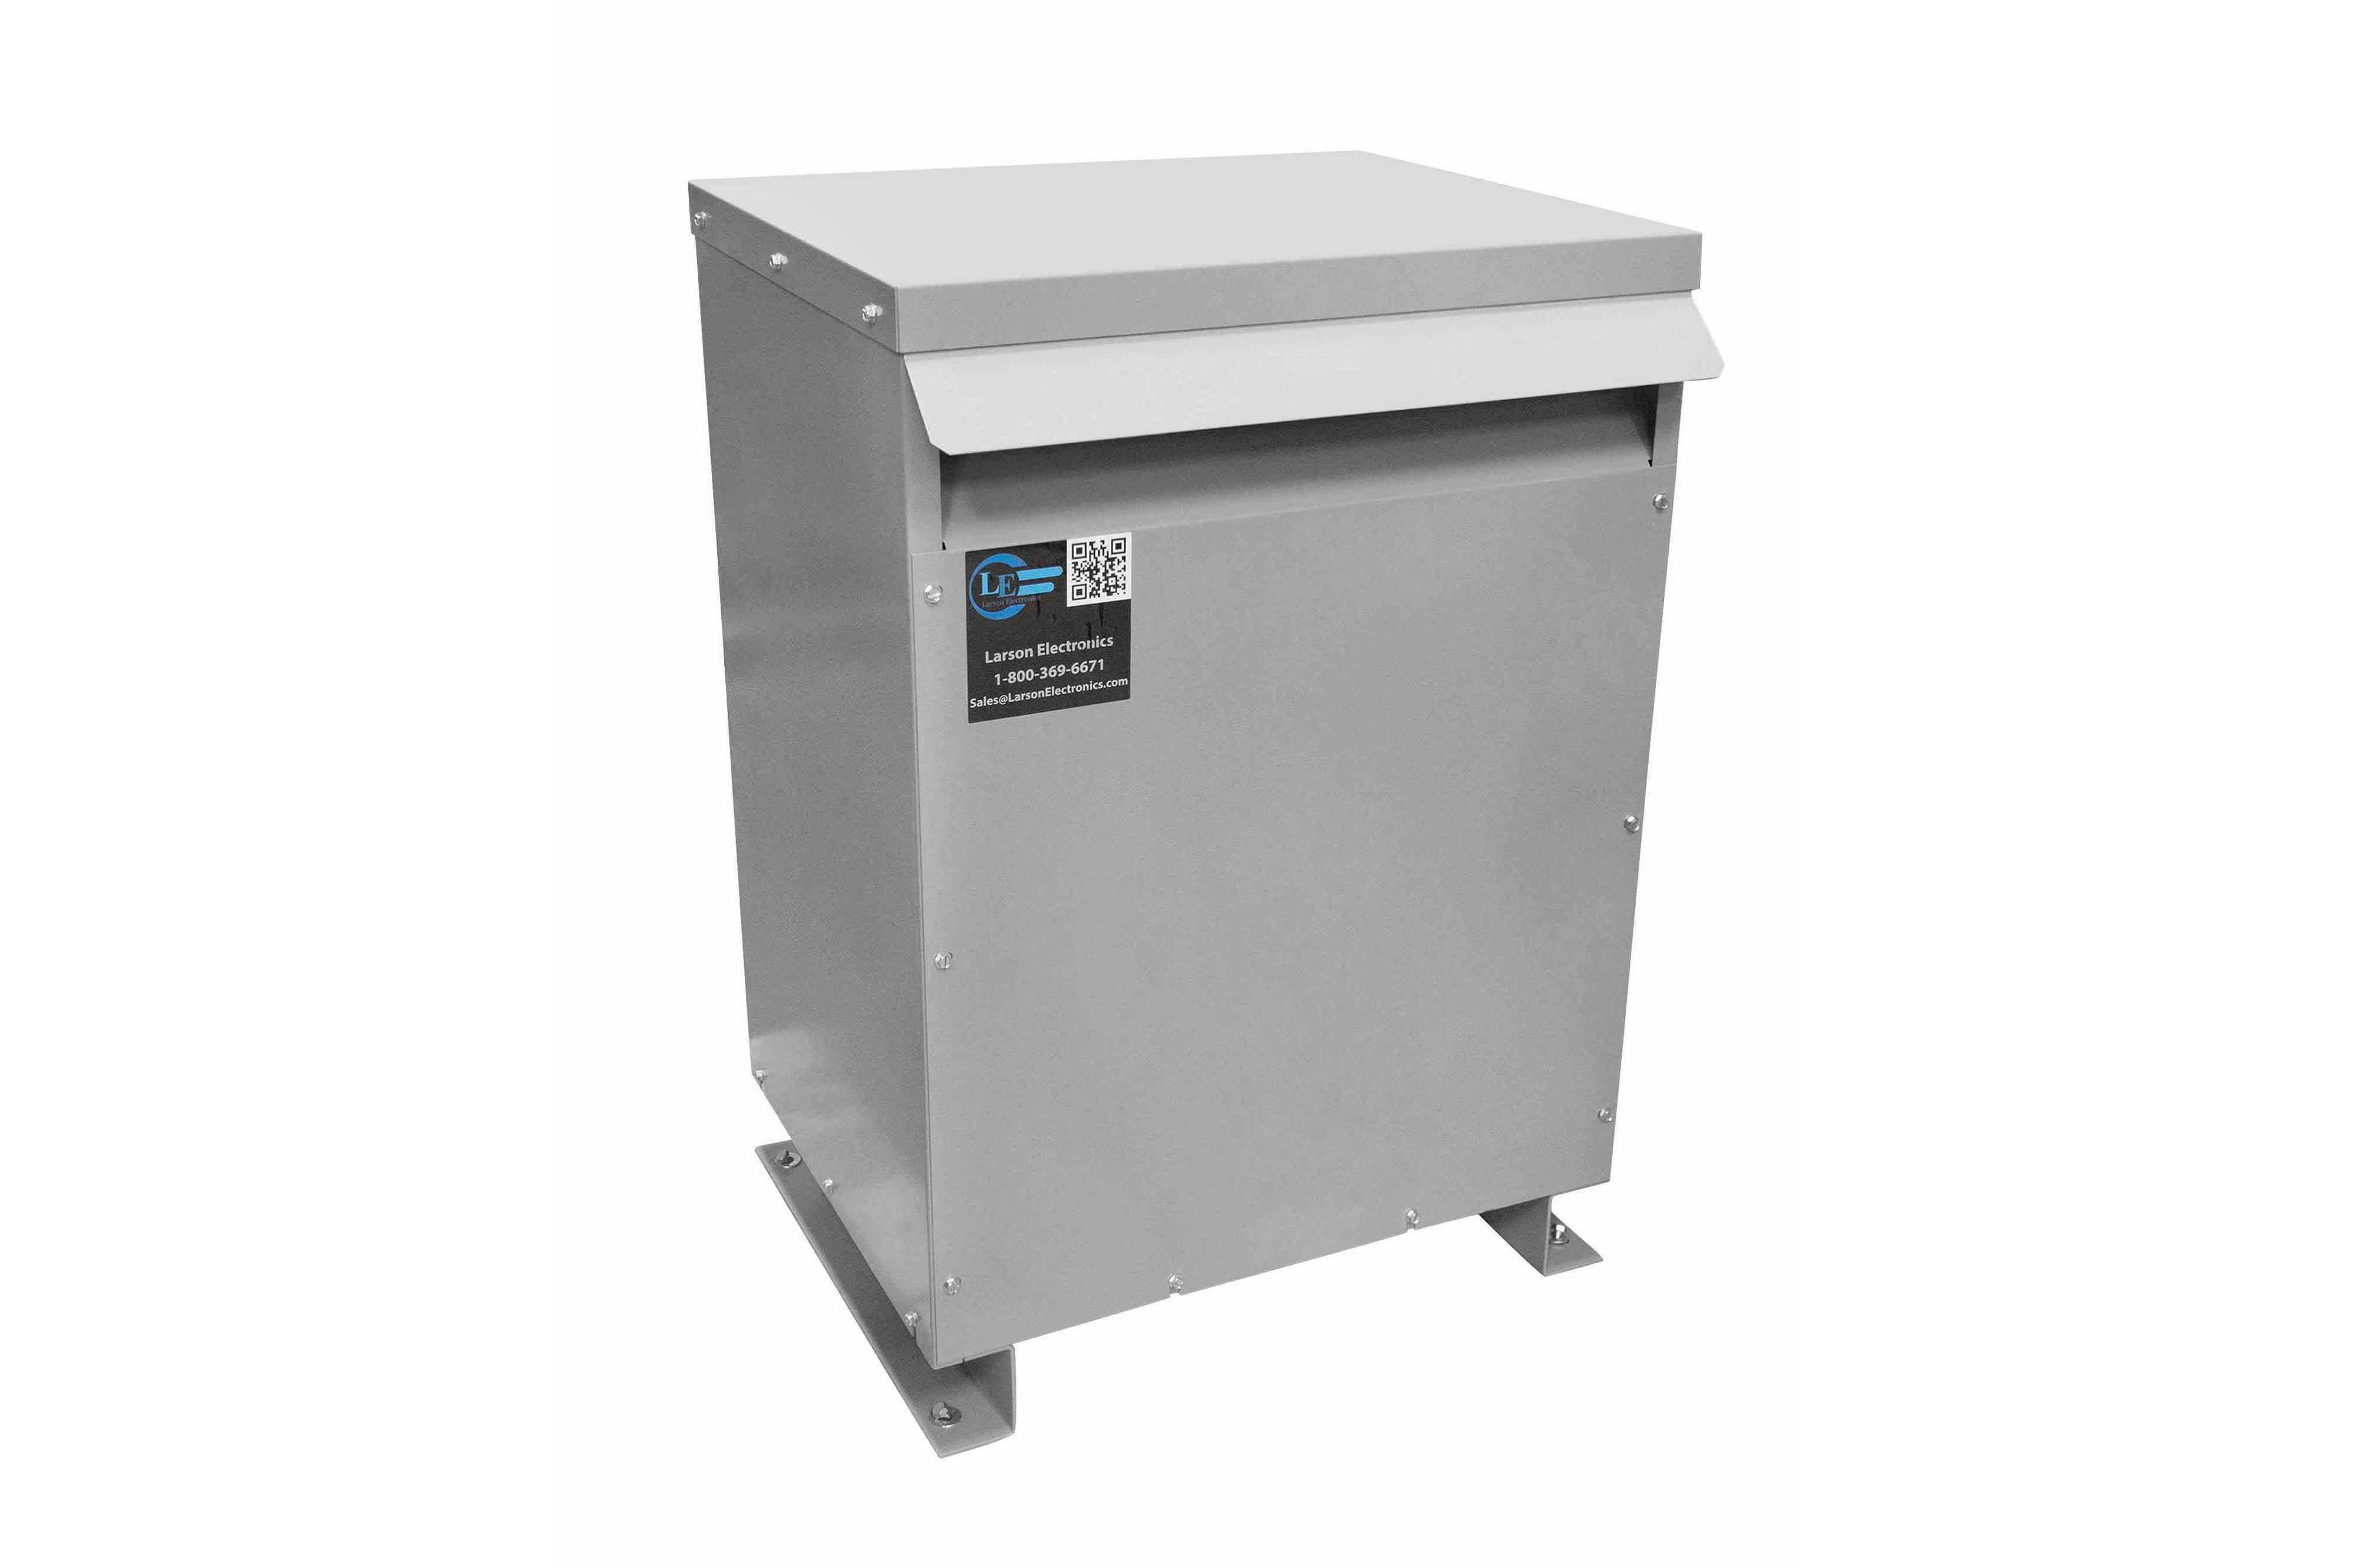 37.5 kVA 3PH Isolation Transformer, 460V Wye Primary, 240V/120 Delta Secondary, N3R, Ventilated, 60 Hz